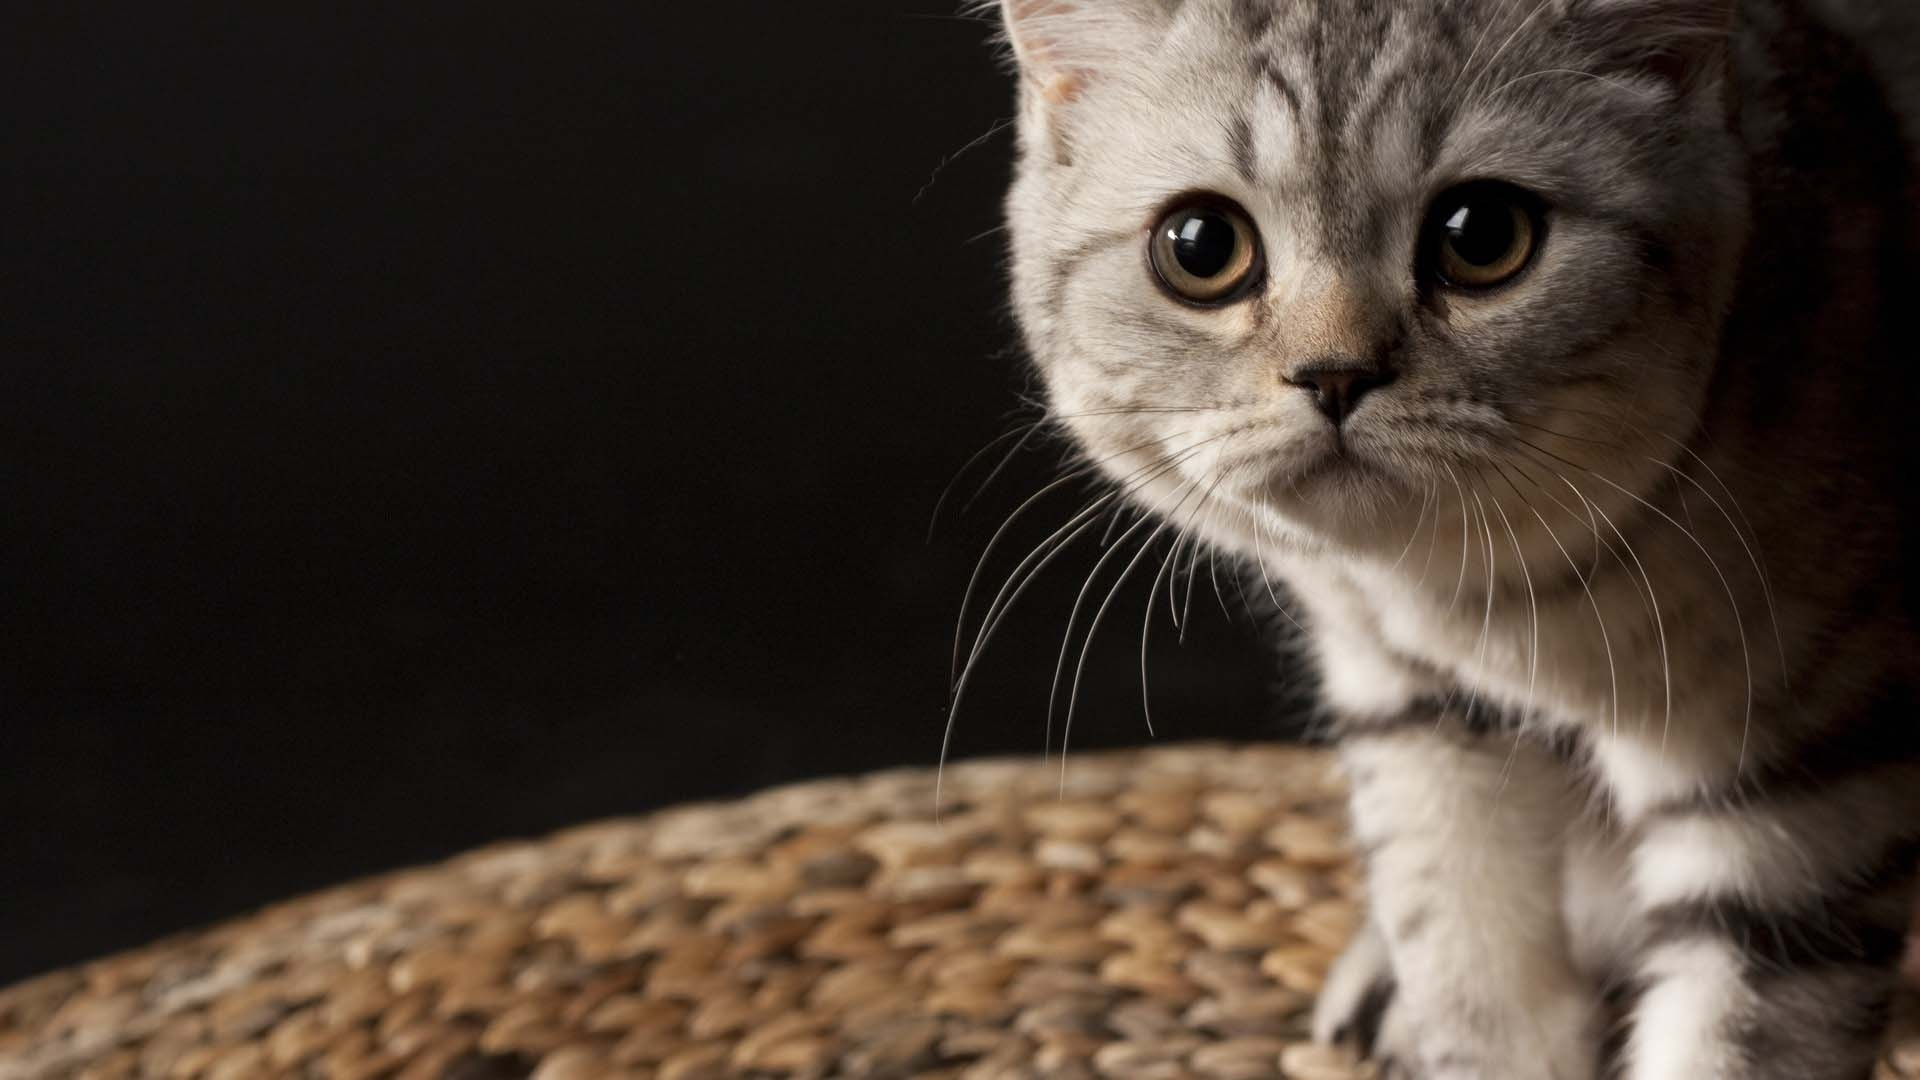 Very Nice Little Fantastic Cat 4k Wallpaper